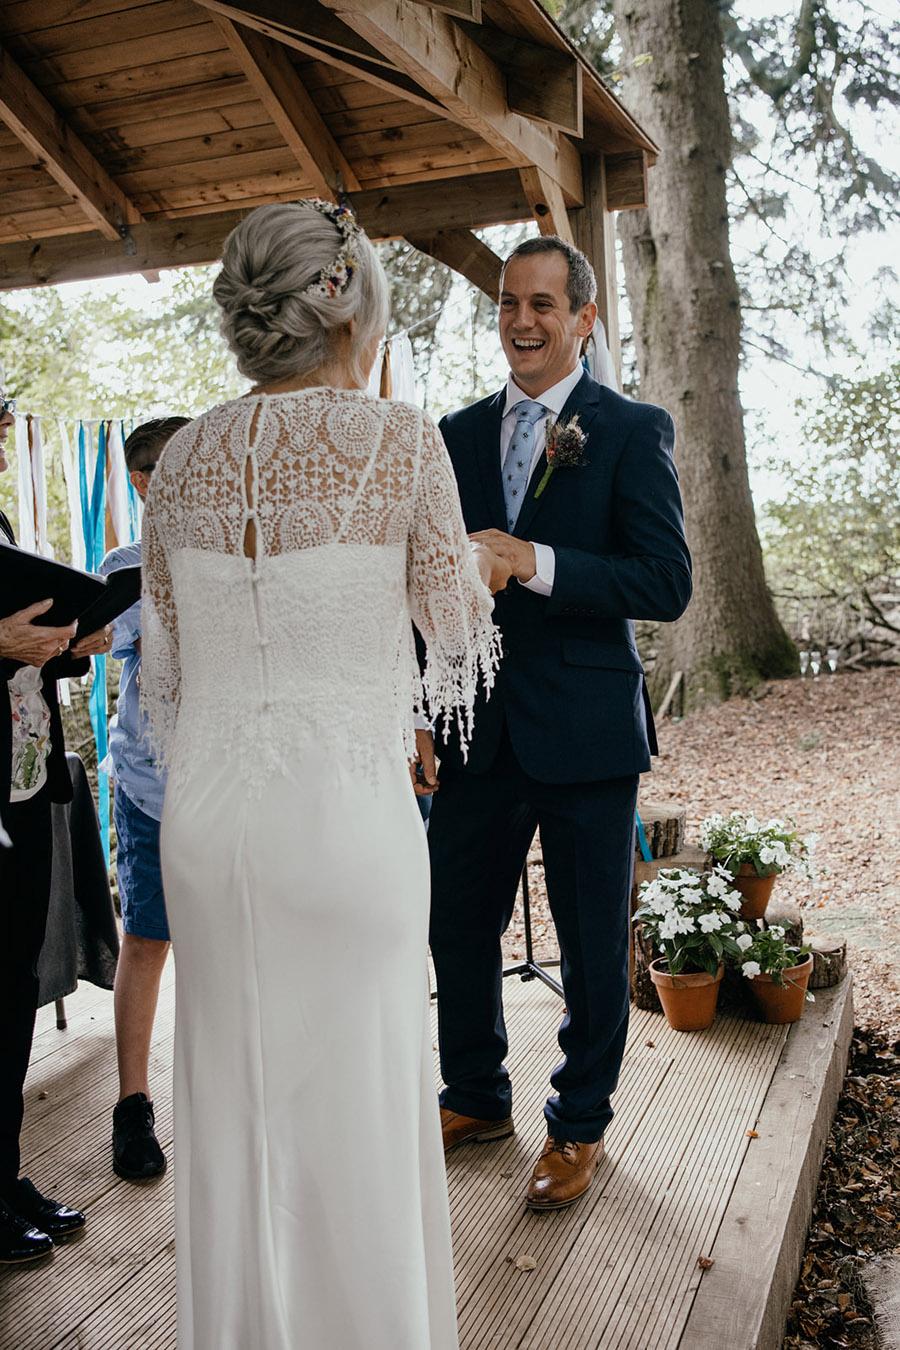 Laura & Dicky's amazingly creative tipi wedding, with Ellen J Photography (10)